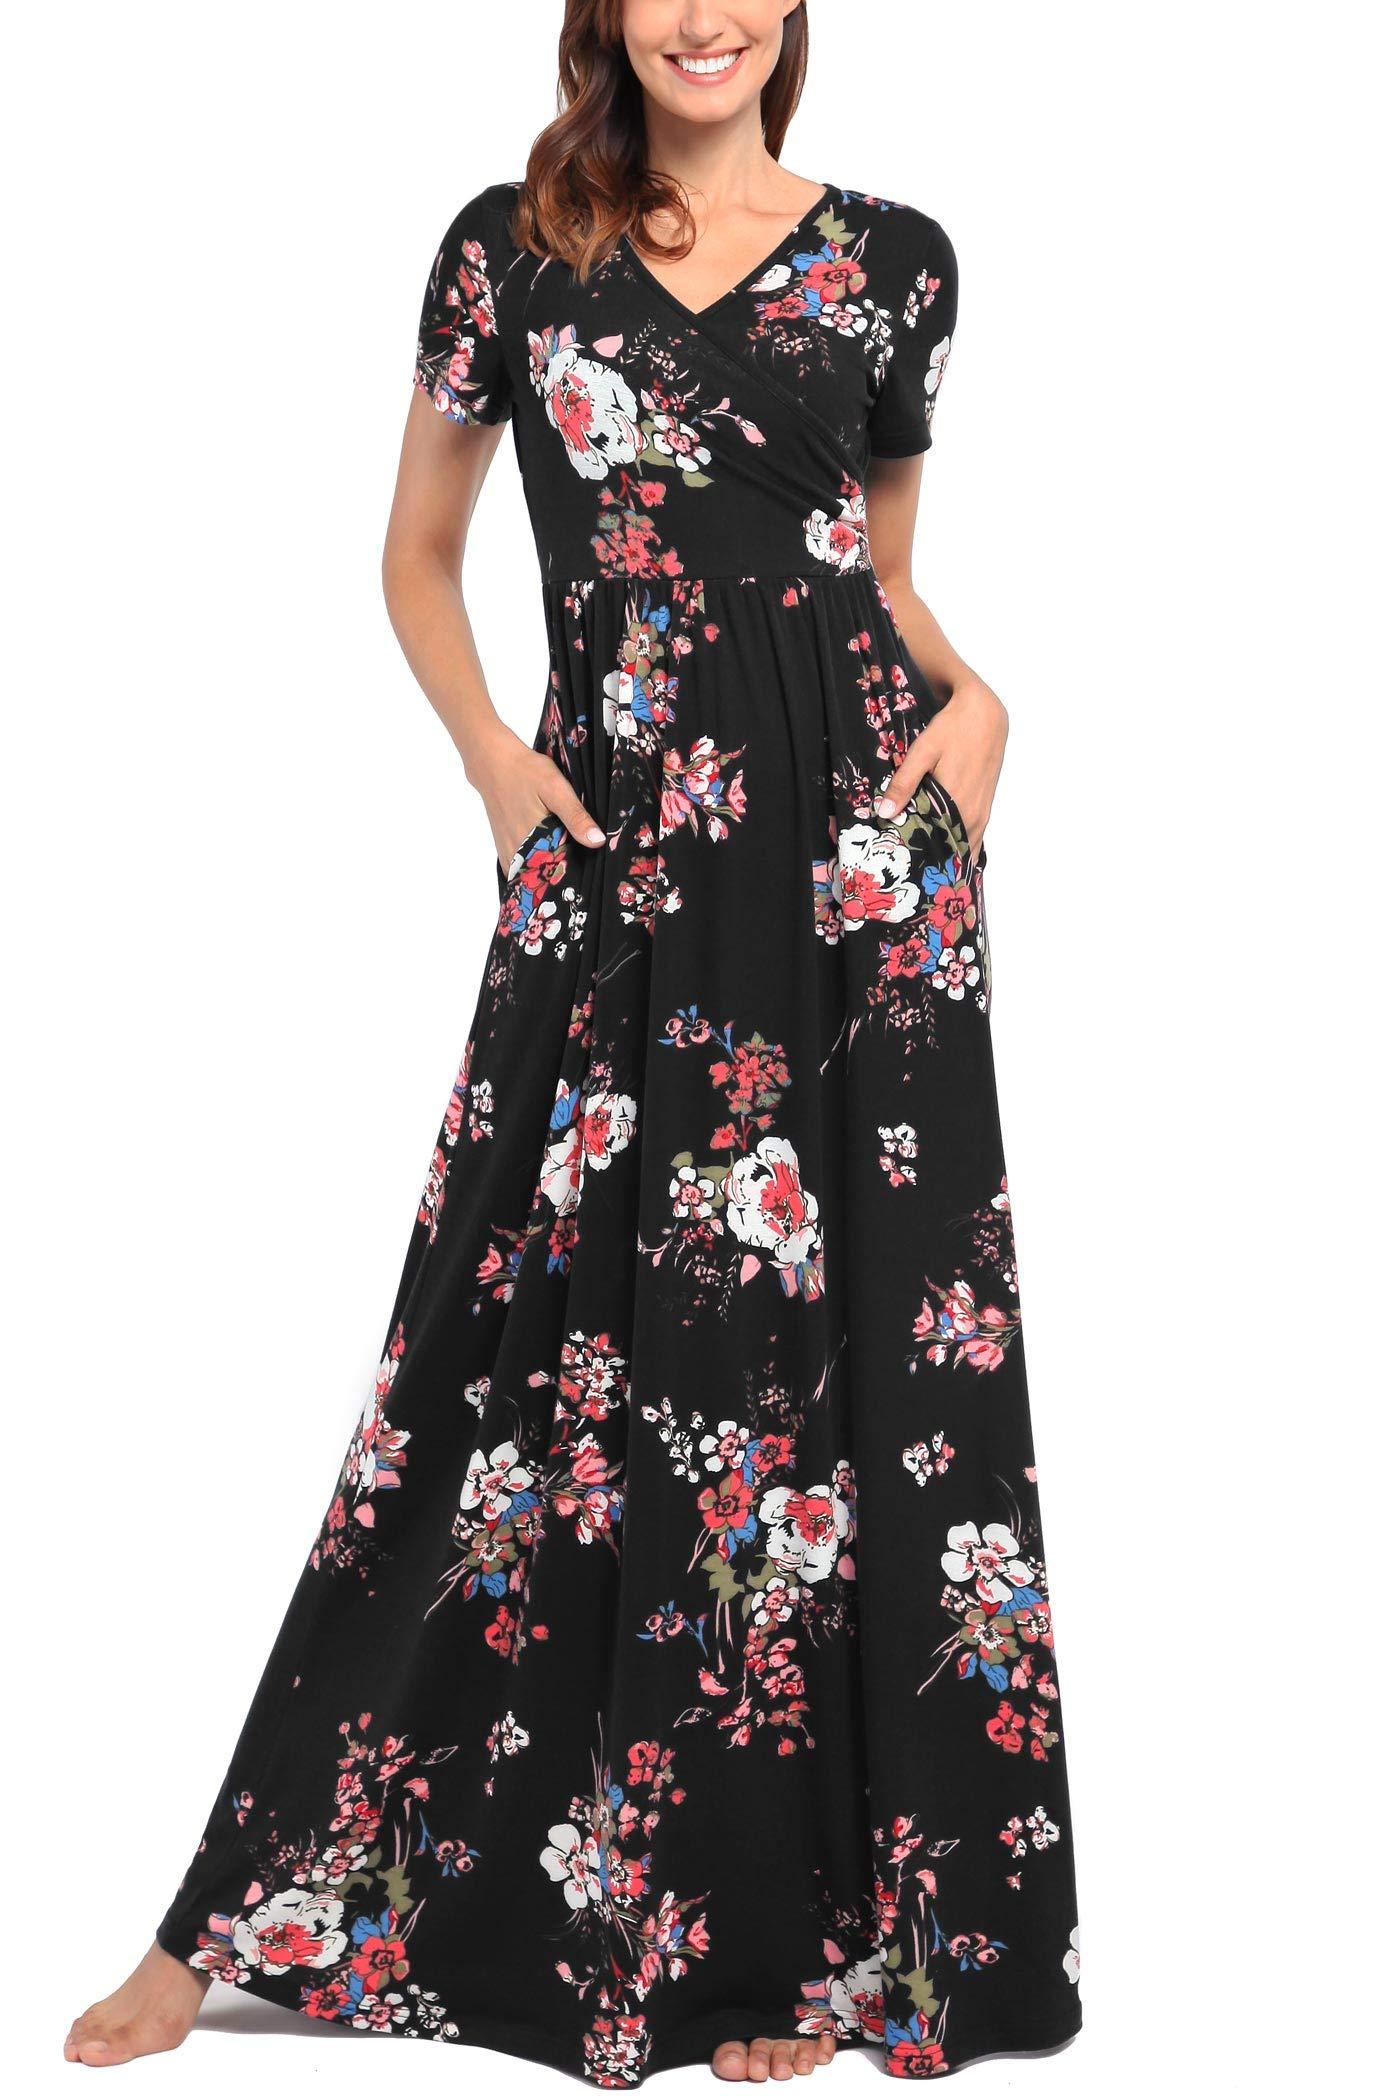 Comila Short Sleeve Maxi Dresses for Women, Summer V Neck Dress Pockets Vintage Floral Maxi Casual Dress with Pockets Elegant Work Office Long Dress Black S (US 4-6)